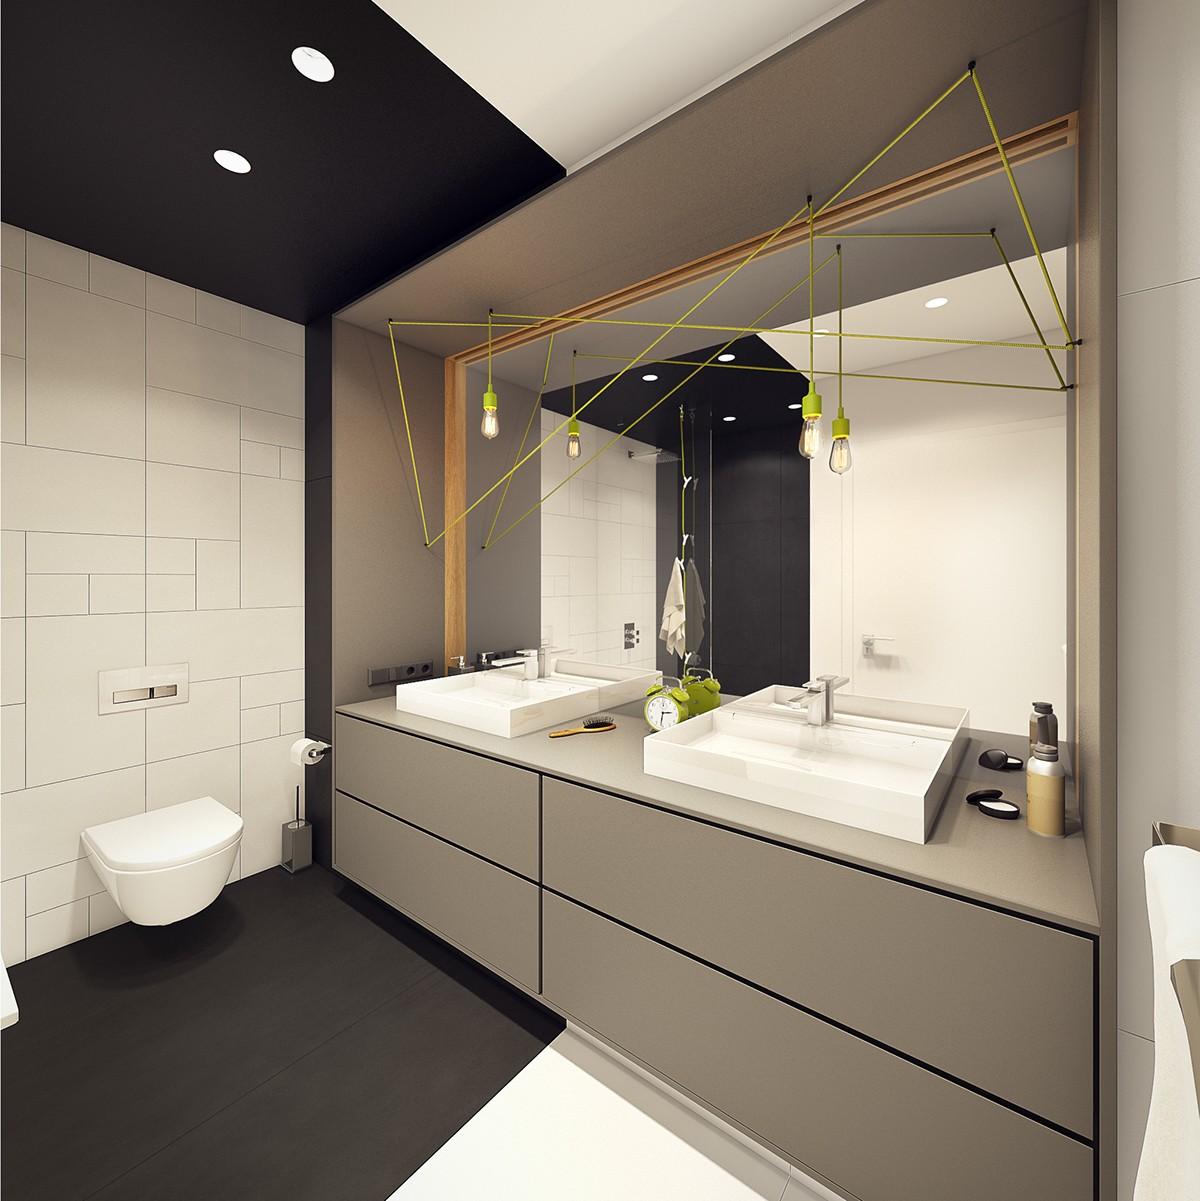 Scandinavian Bathroom Design Ideas: A Modern Scandinavian Inspired Apartment With Ingenius